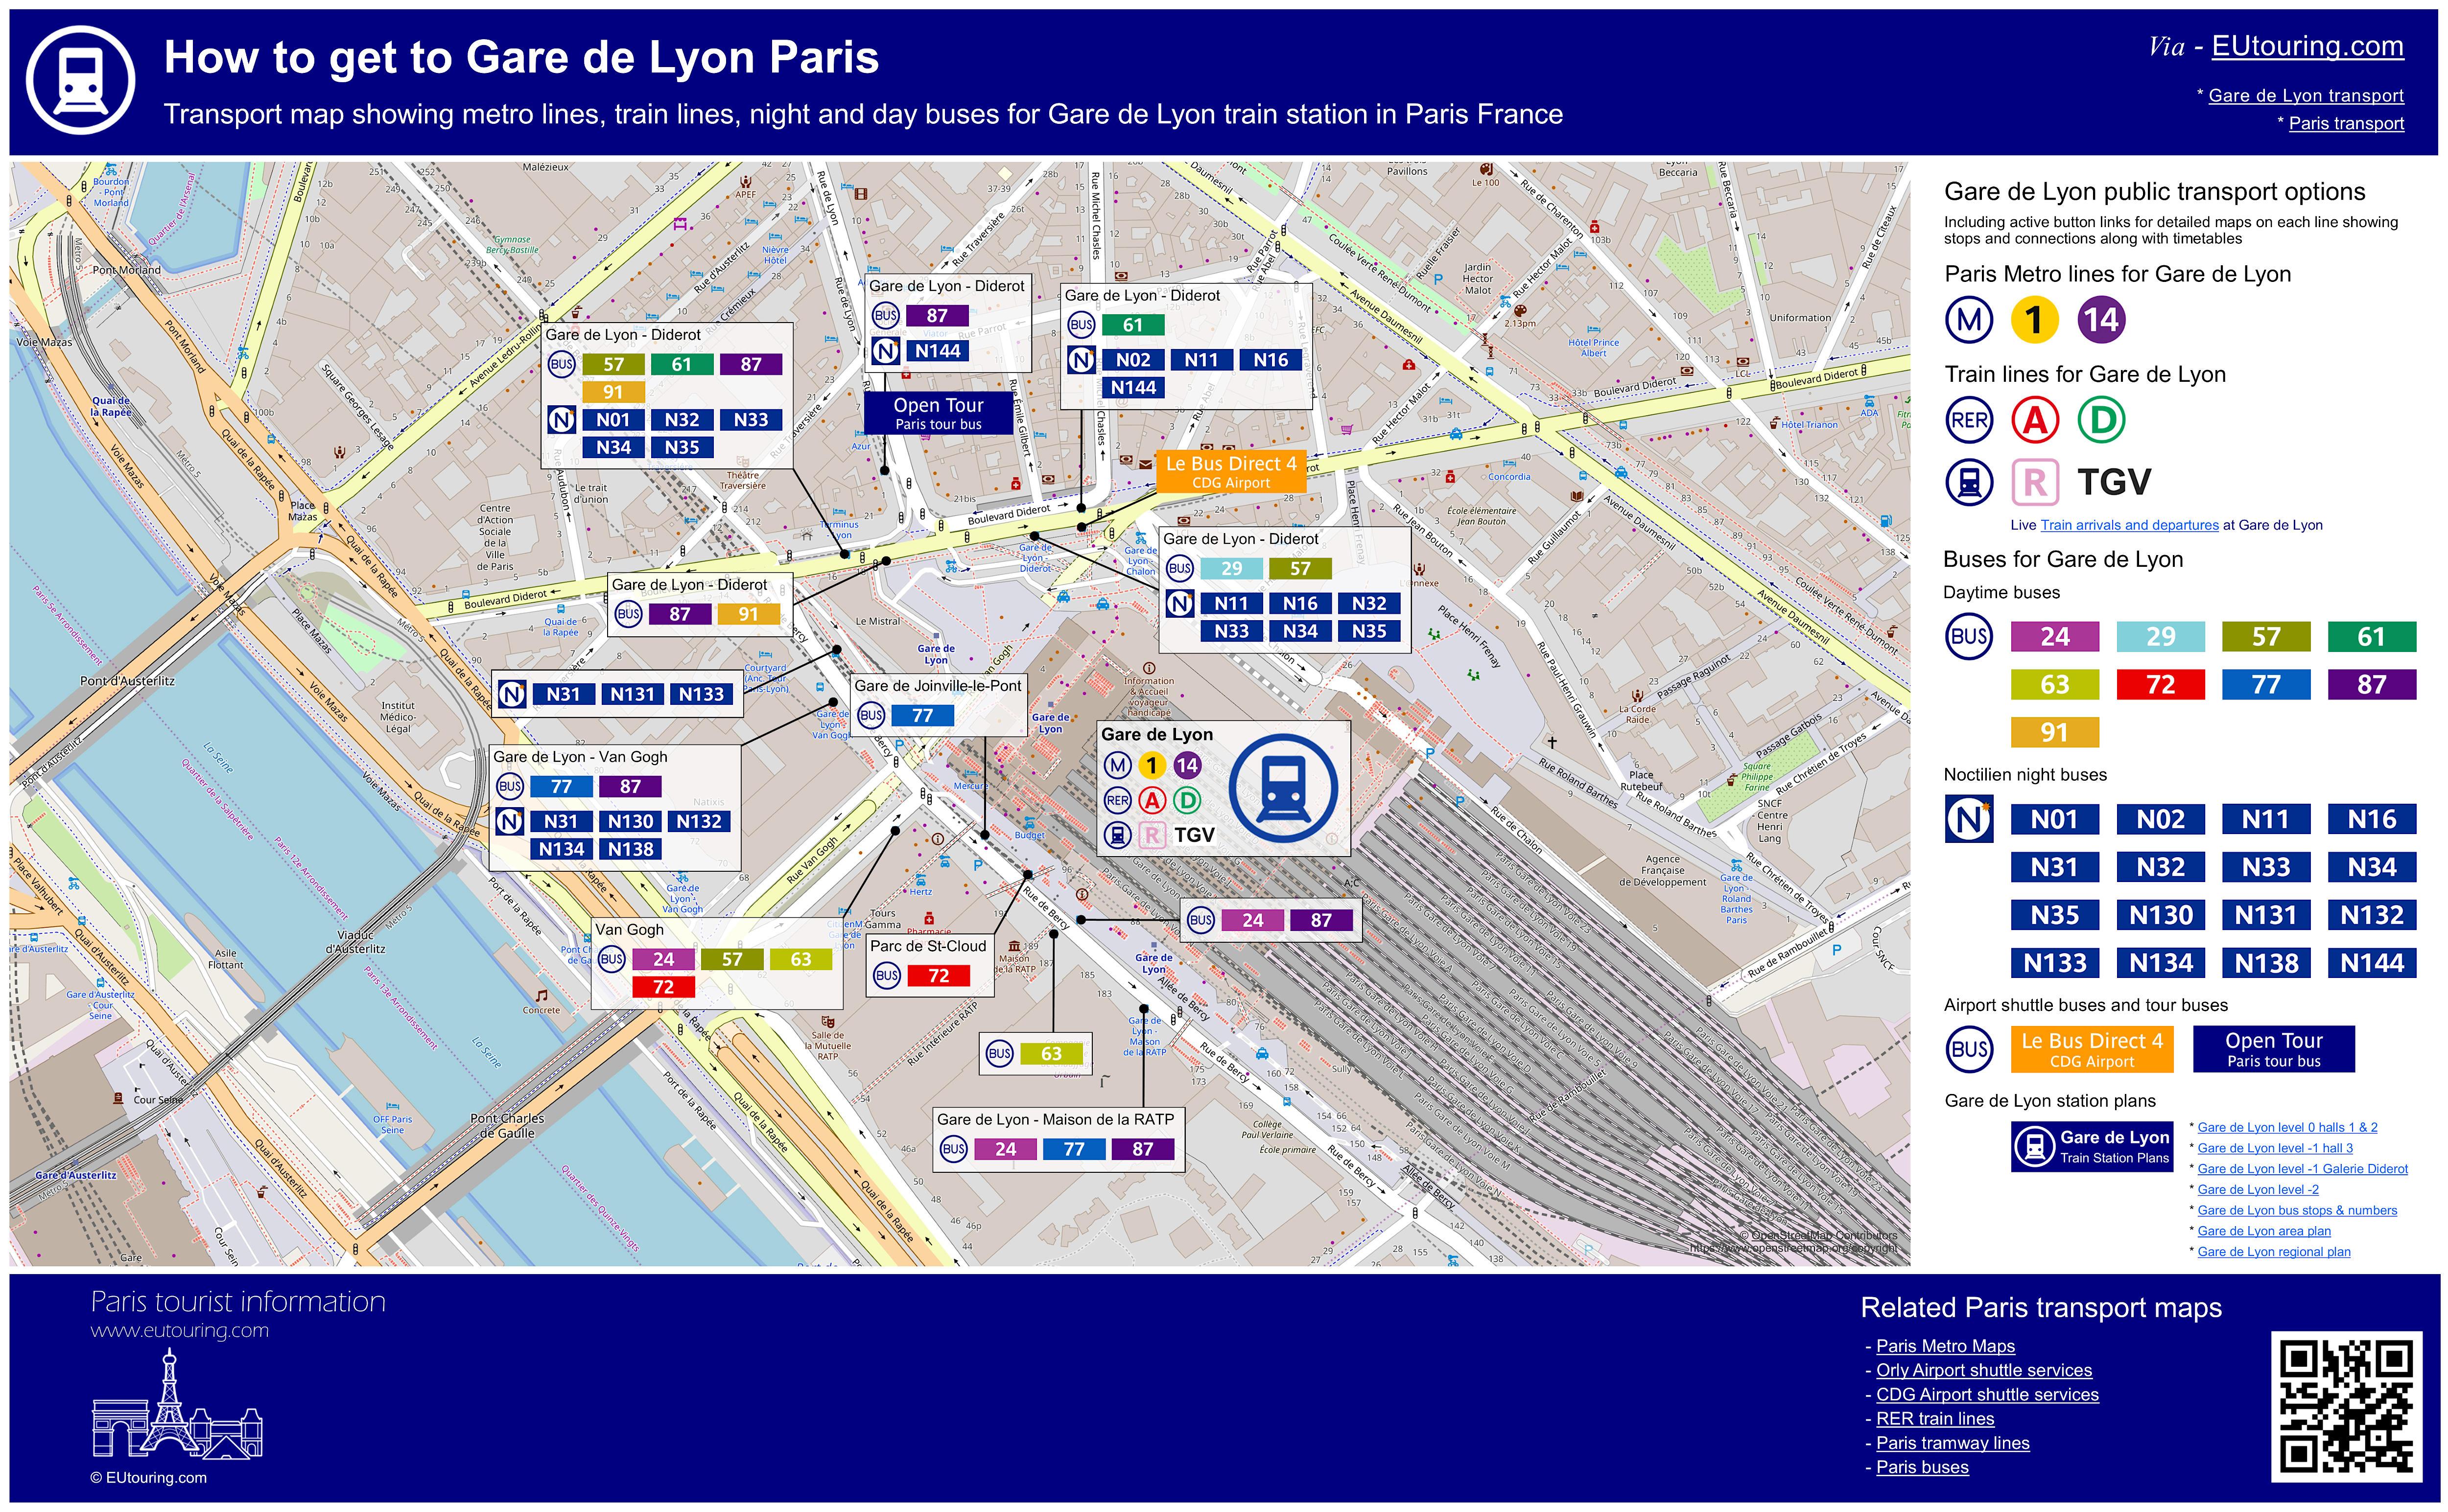 Restaurant Americain Plan De Campagne how to get to gare de lyon in paris using public transport